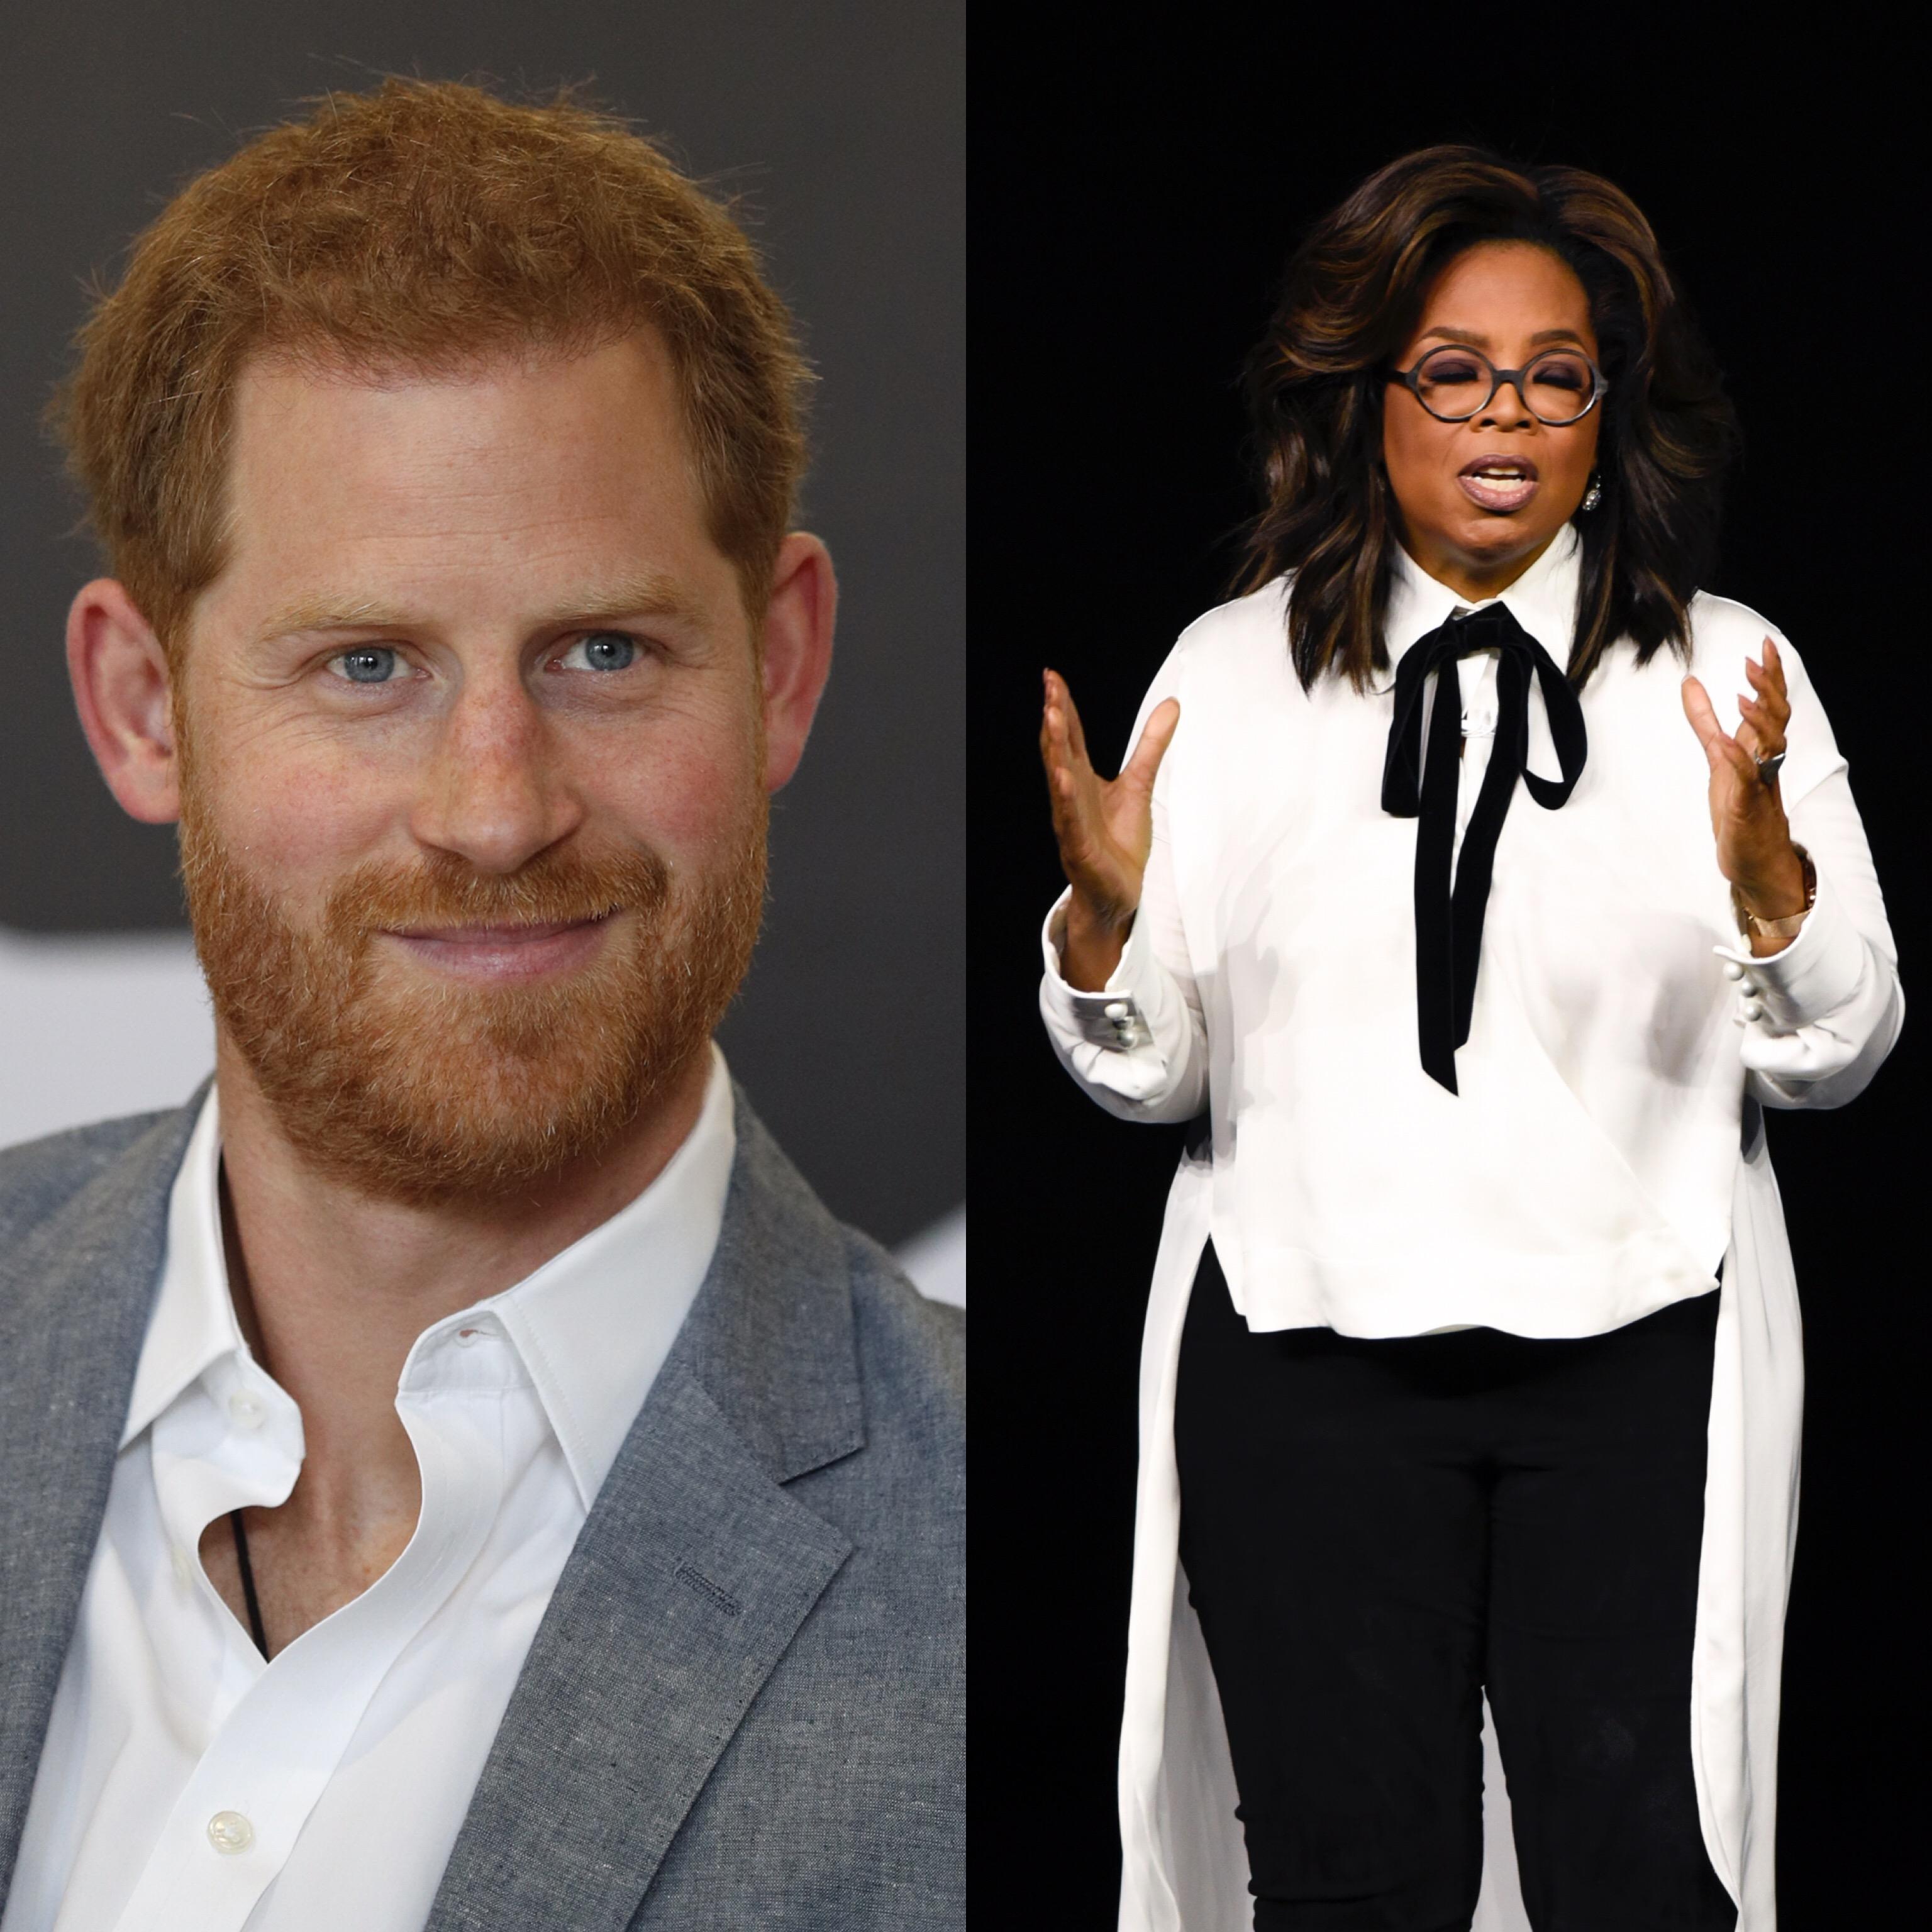 Prince Harry & Oprah Winfrey